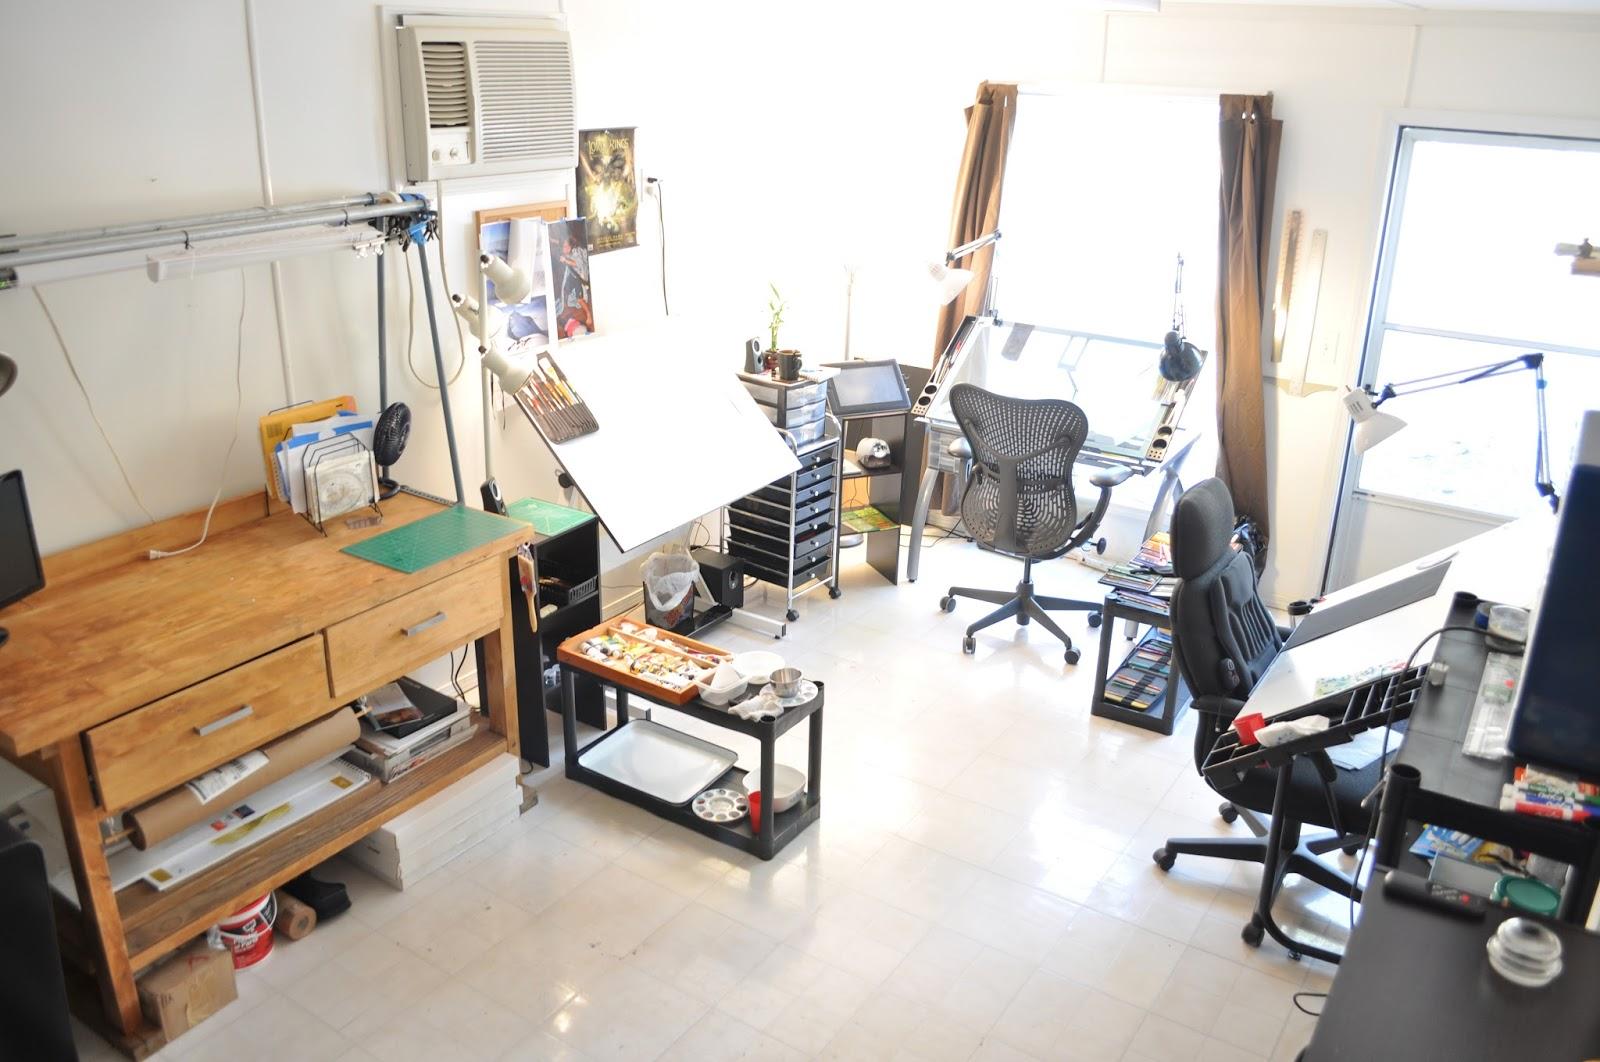 Home Art Studio Muddy Colors Art Studios I Need Your Input